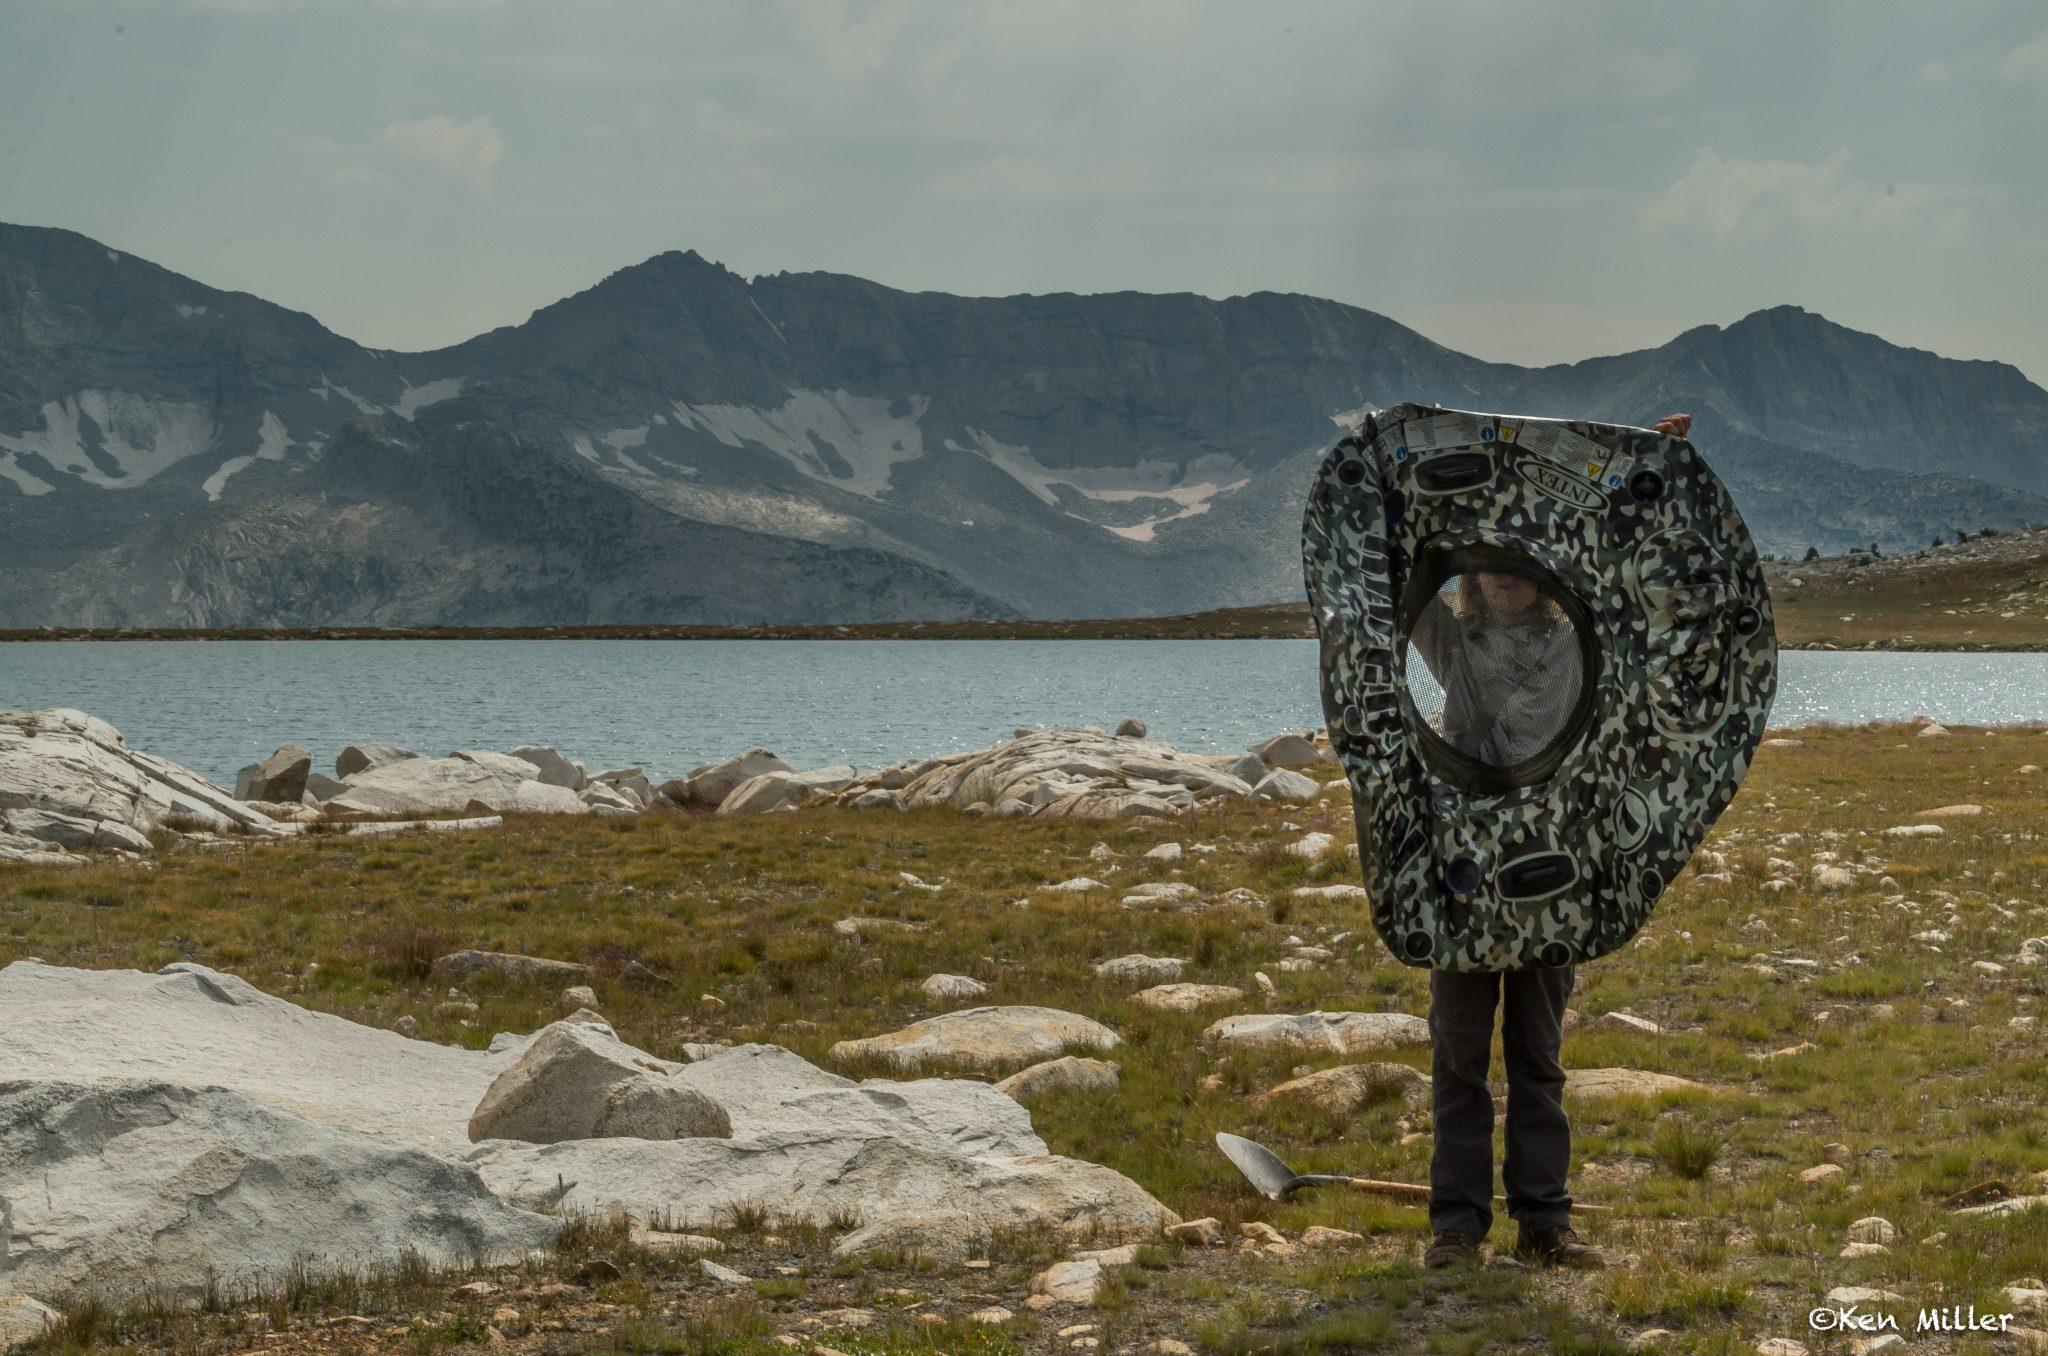 intertube alpine meadow cleanup